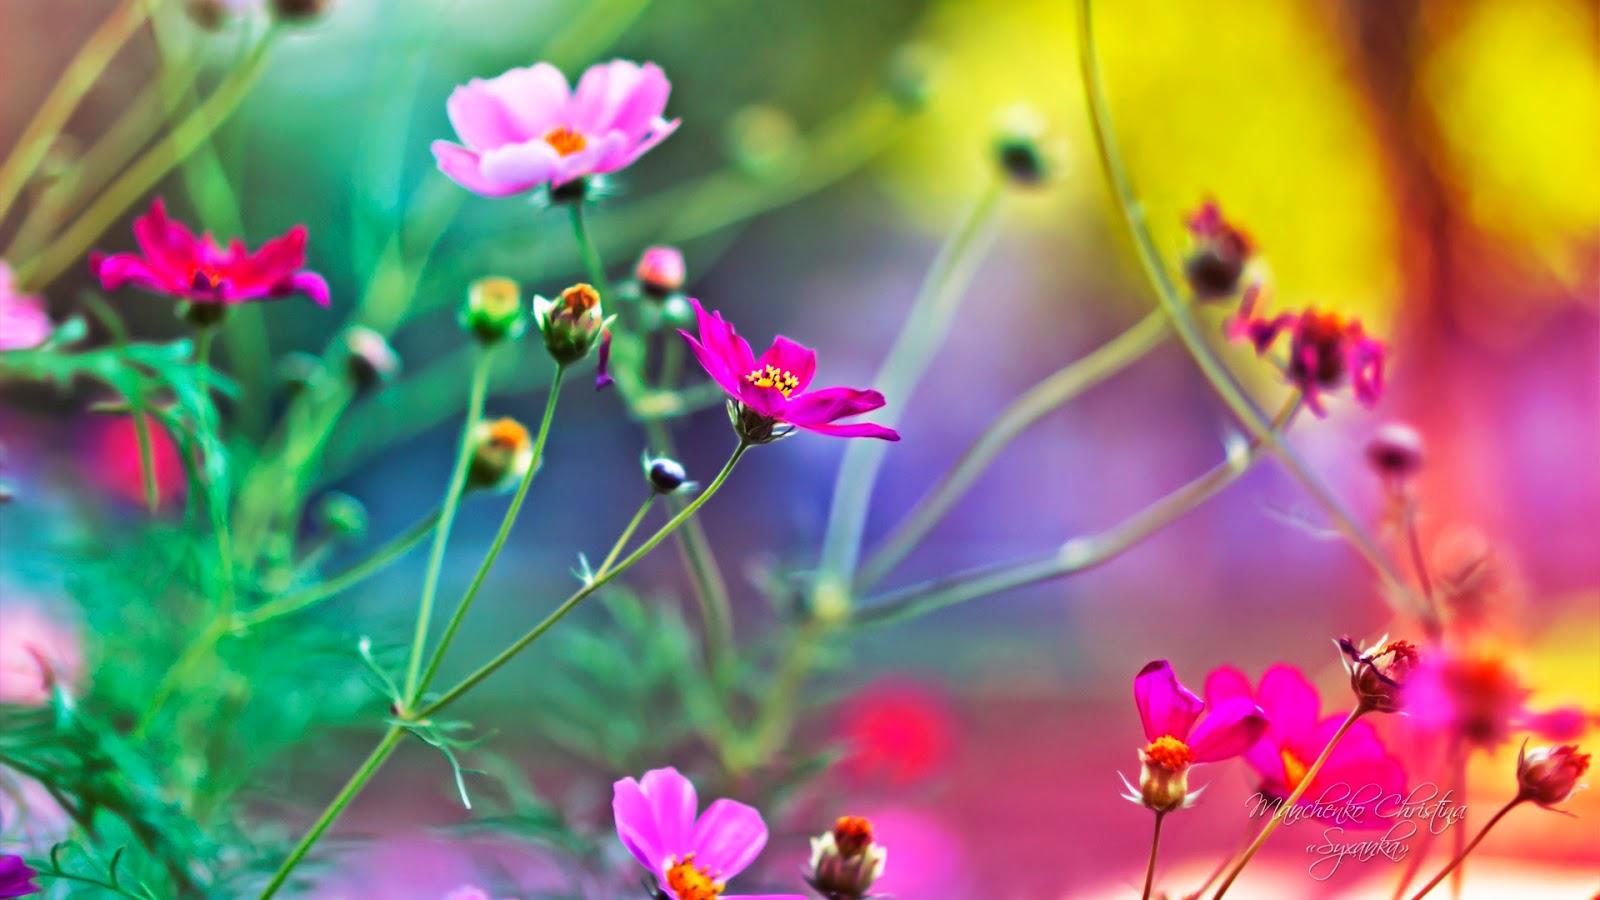 kamal shah: hd flowers wallpapers free